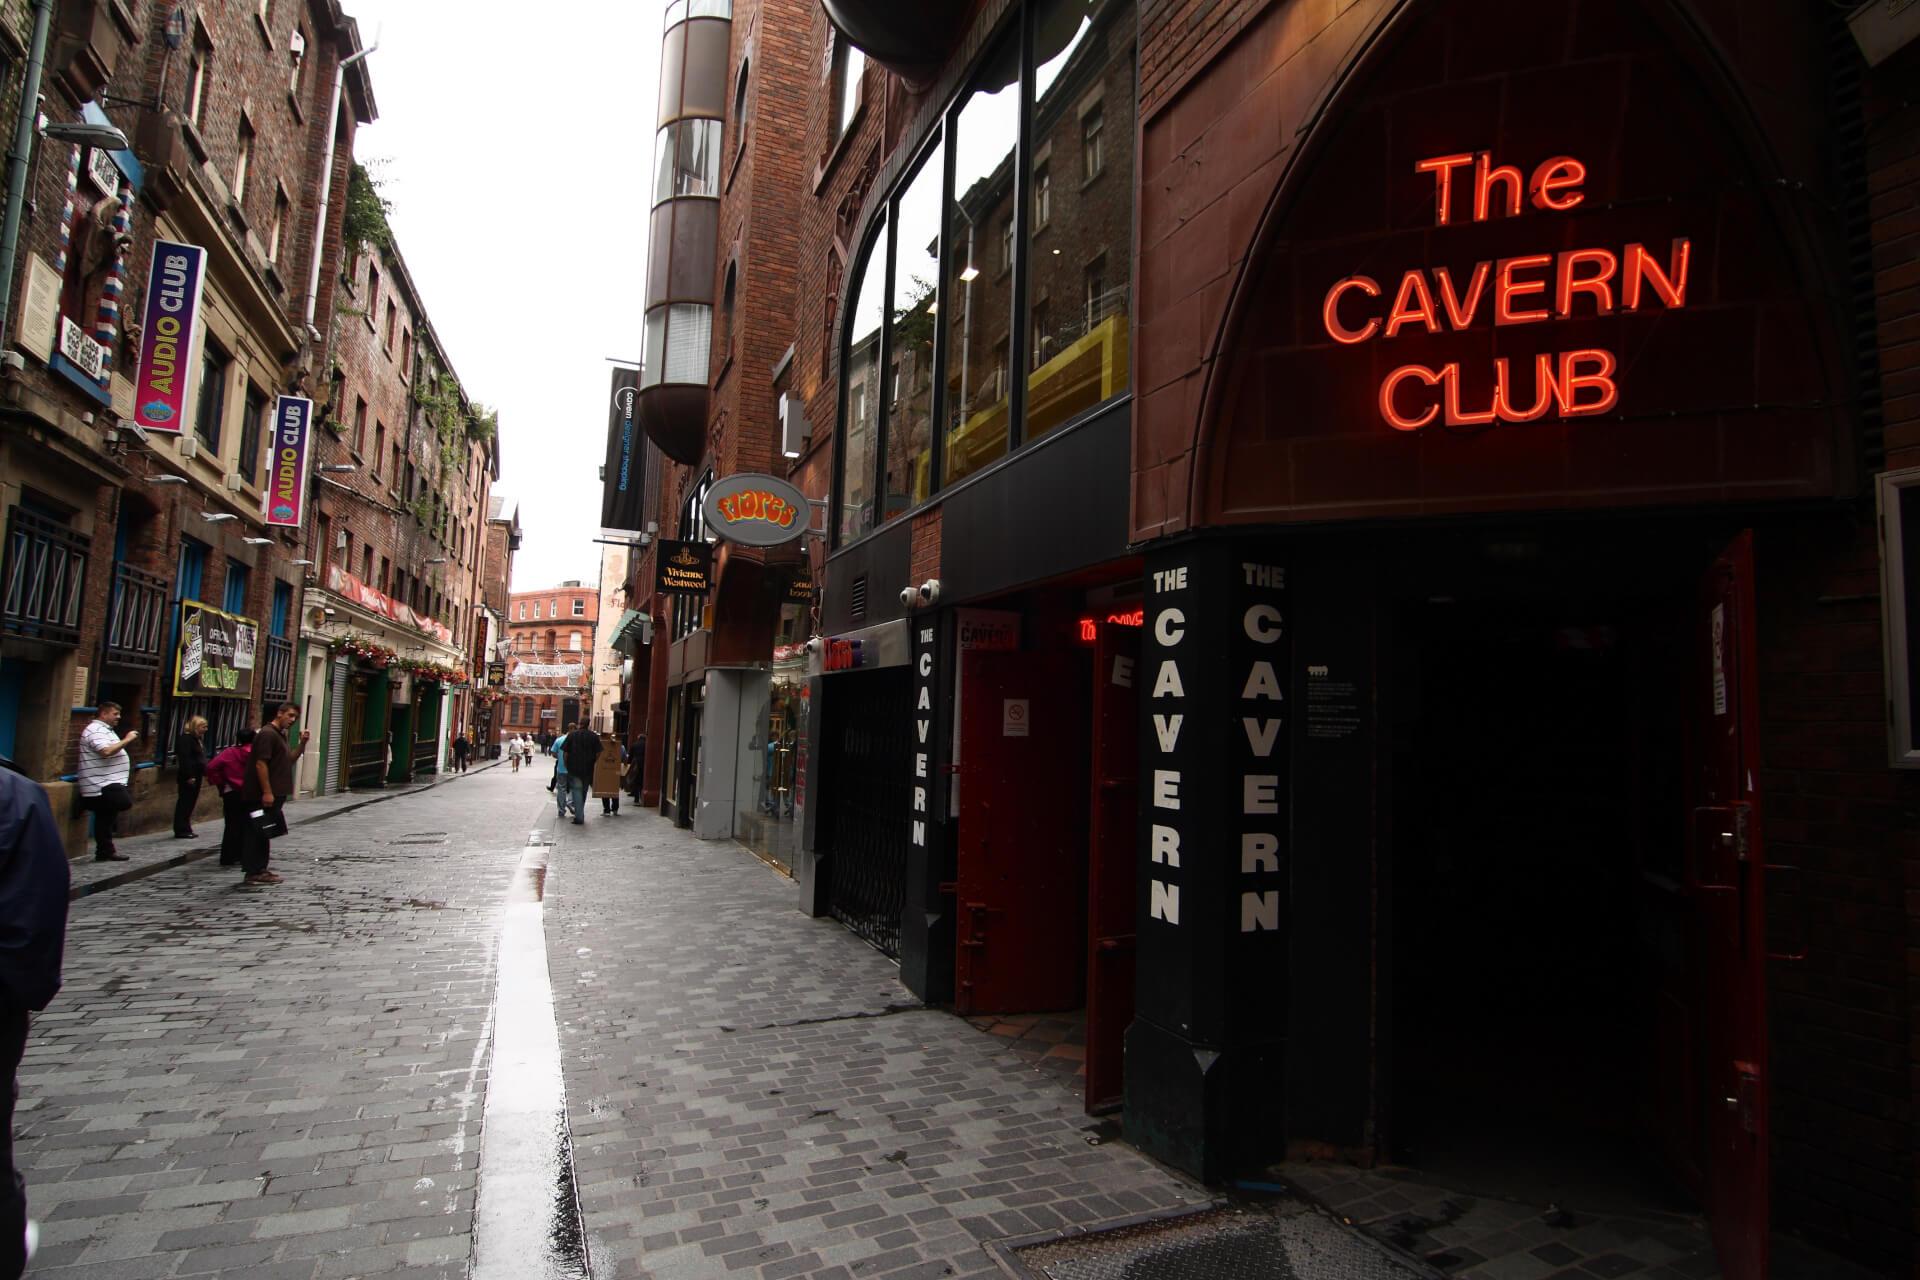 Cavern_Club,_Liverpool,_England1